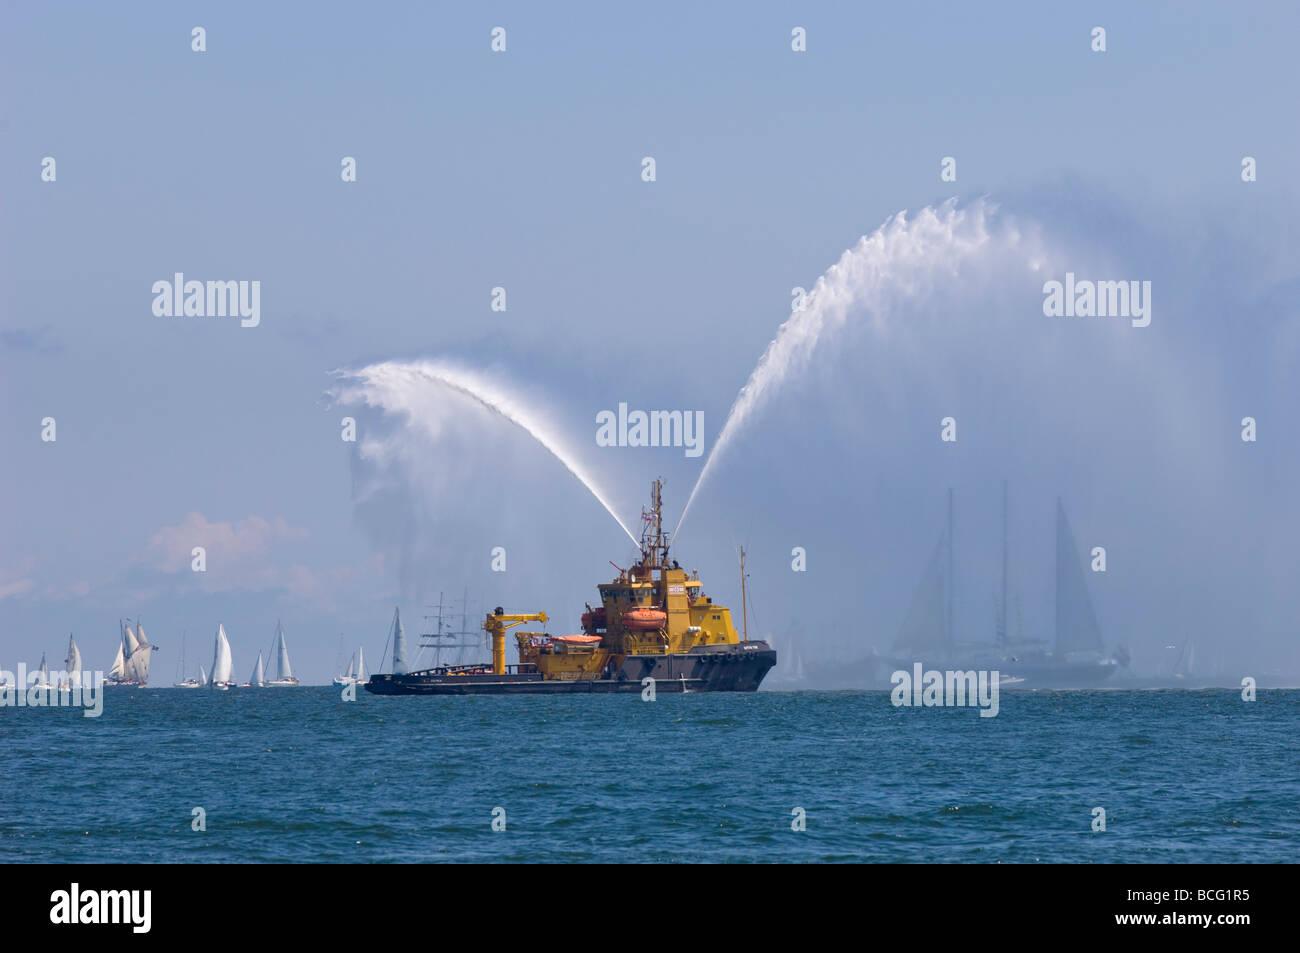 Tall Ships Race 2009 Baltic Sea Gdynia Poland - Stock Image